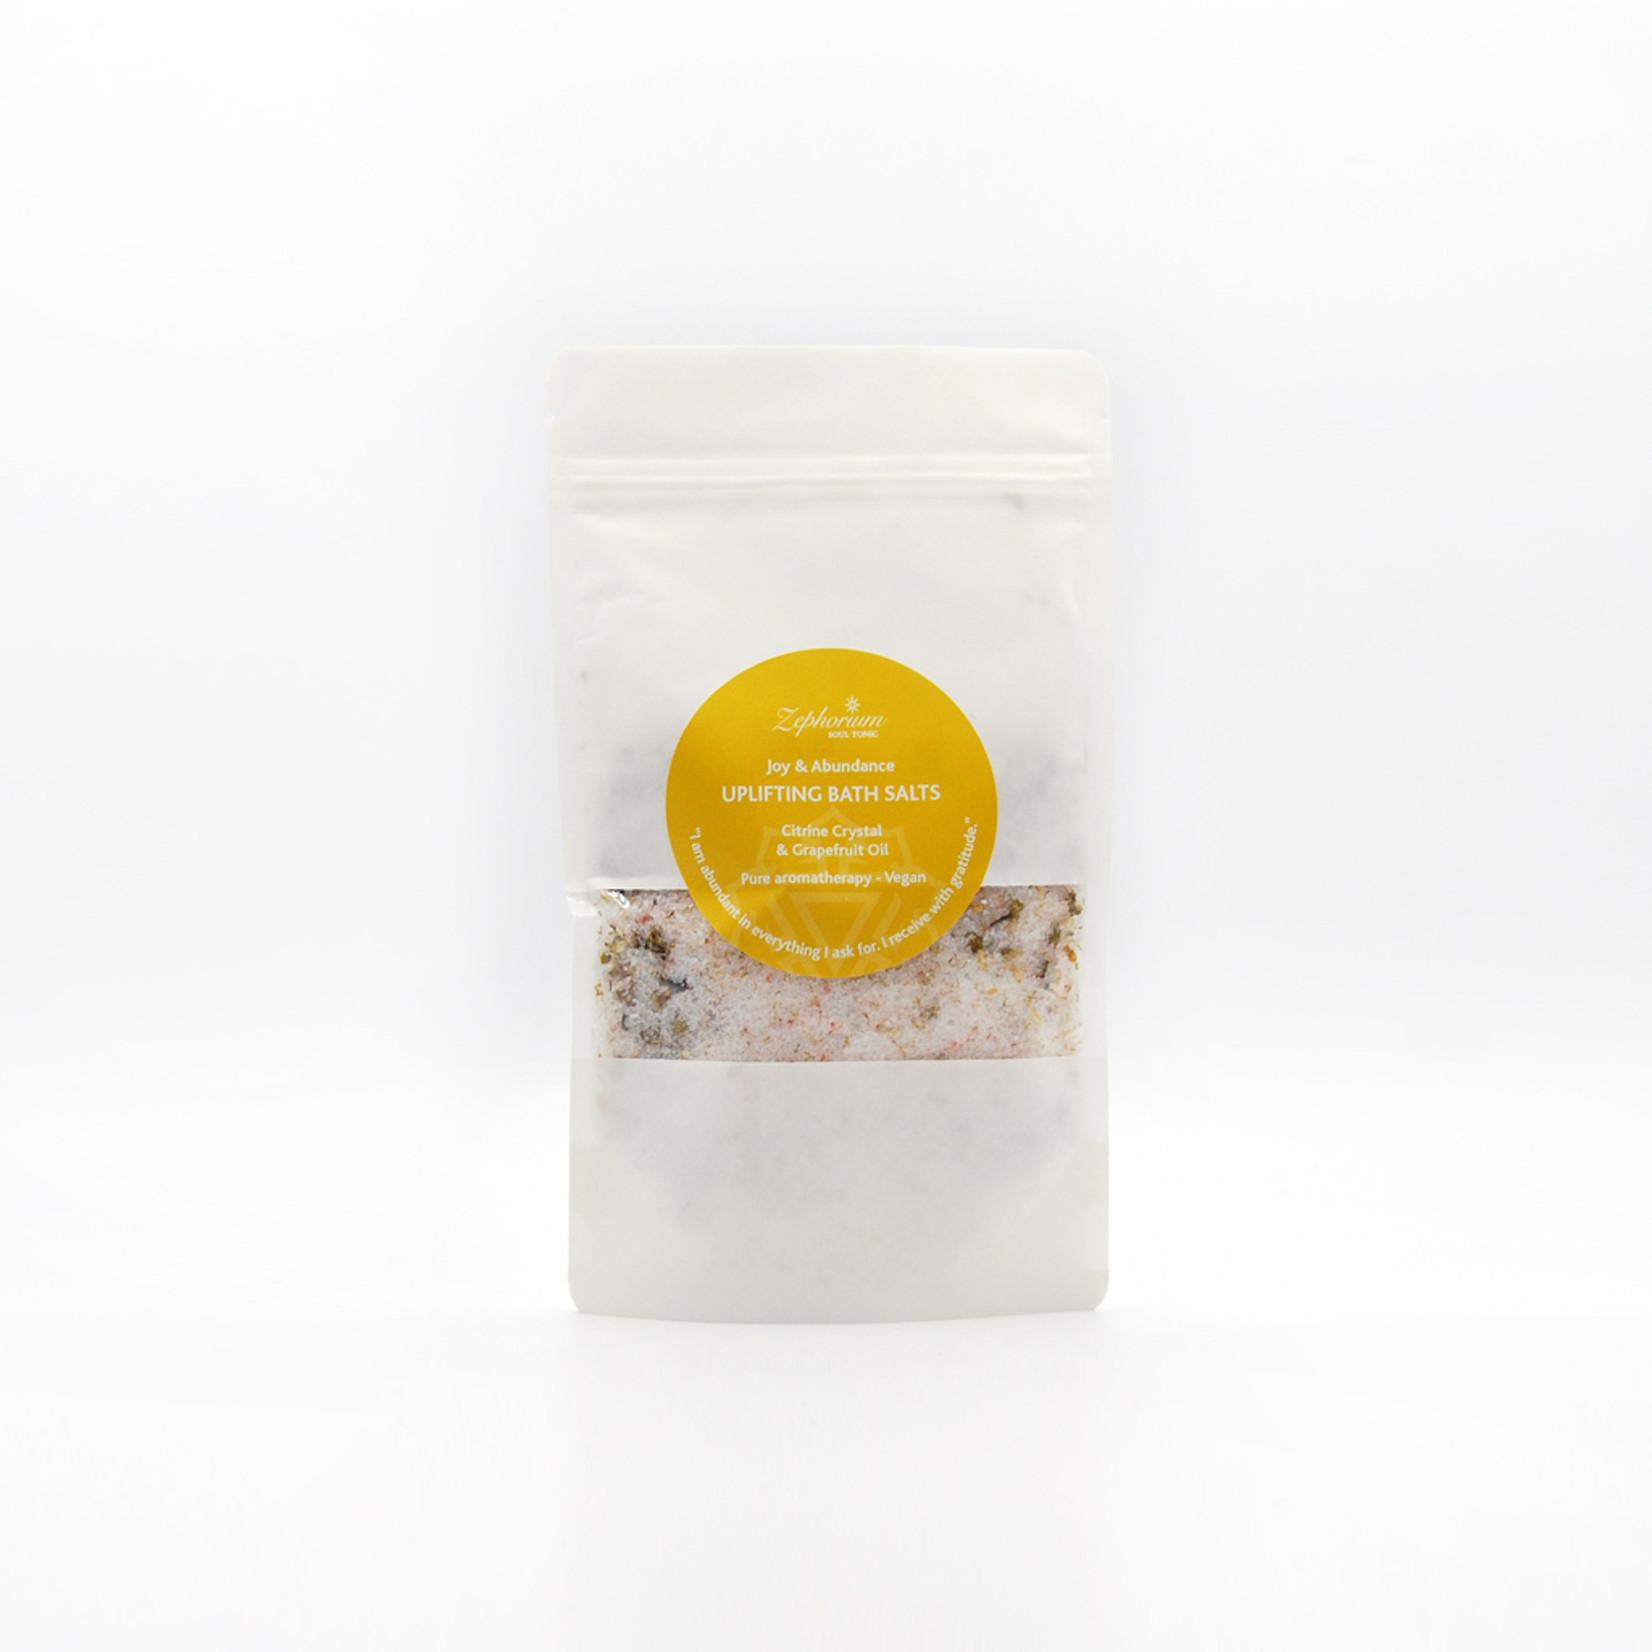 Zephorium Uplifting bath salts - citrine